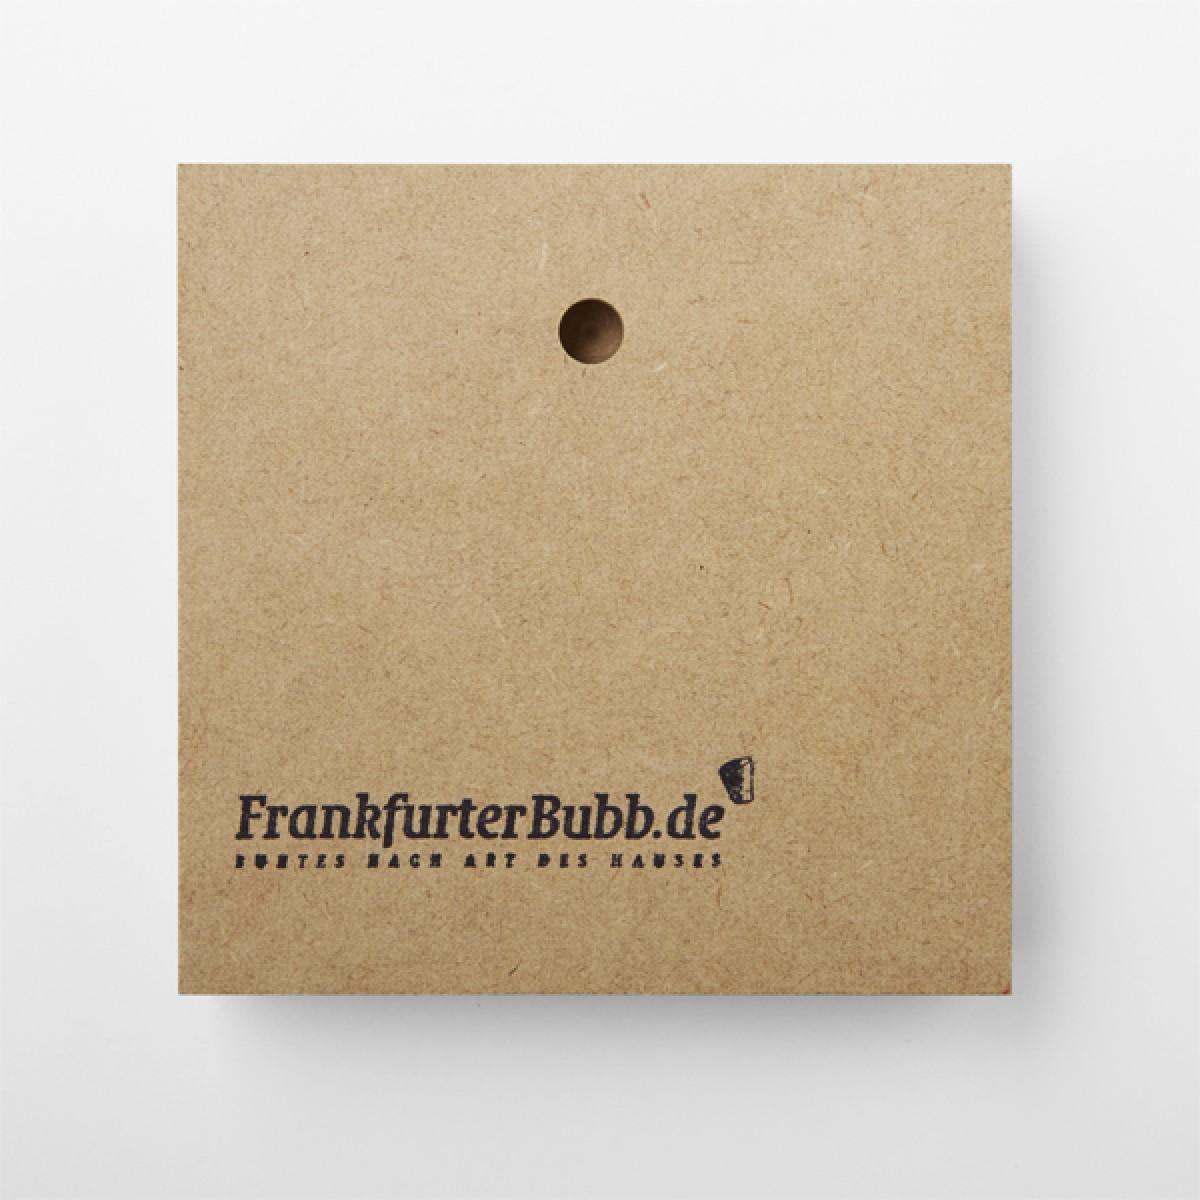 FrankfurterBubb Dream Foto-Kachel